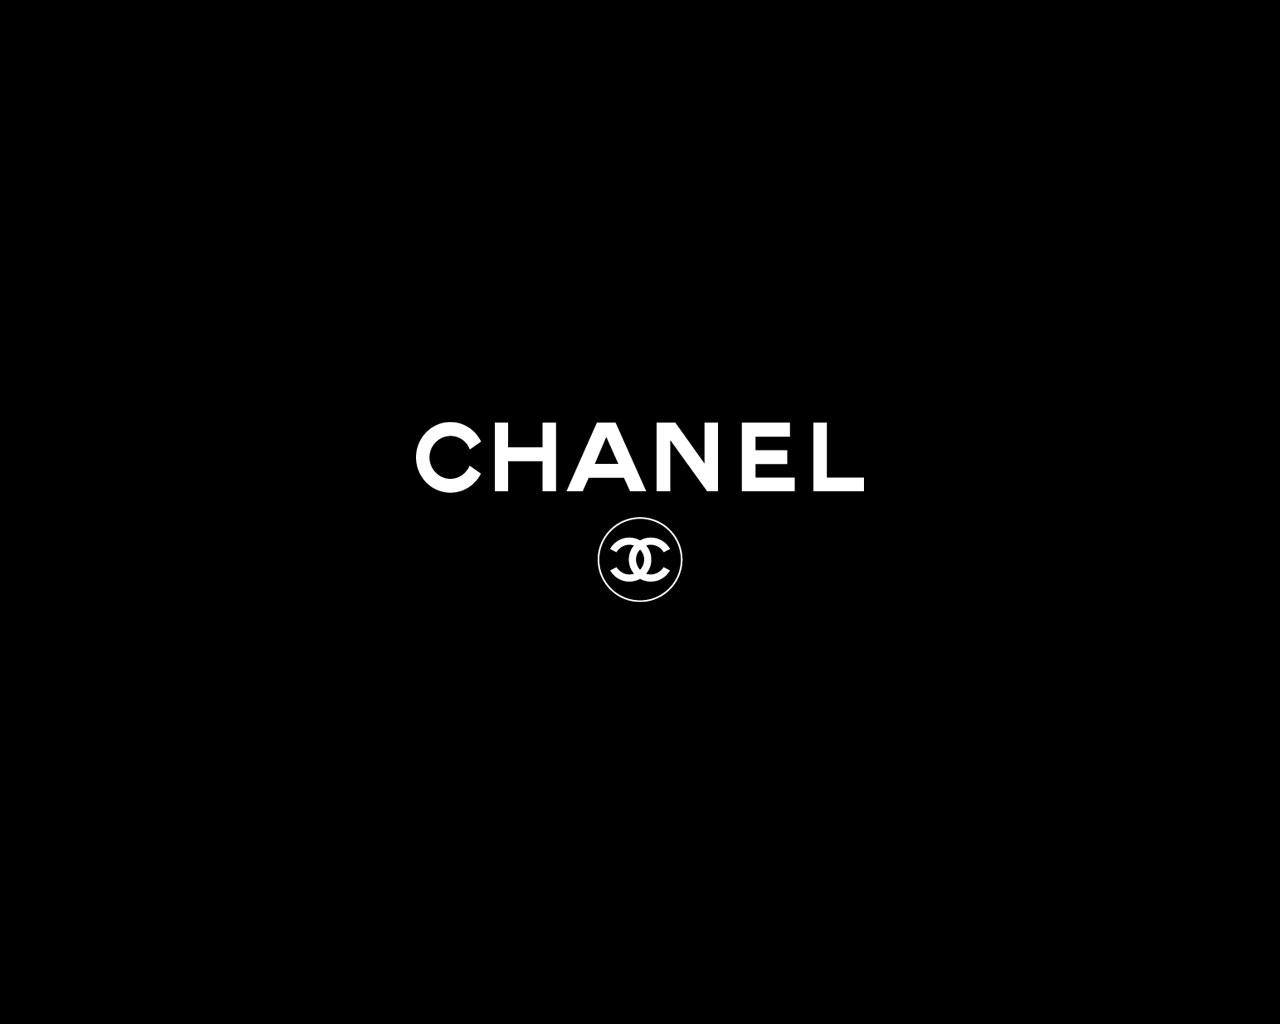 chanel KING 1280x1024